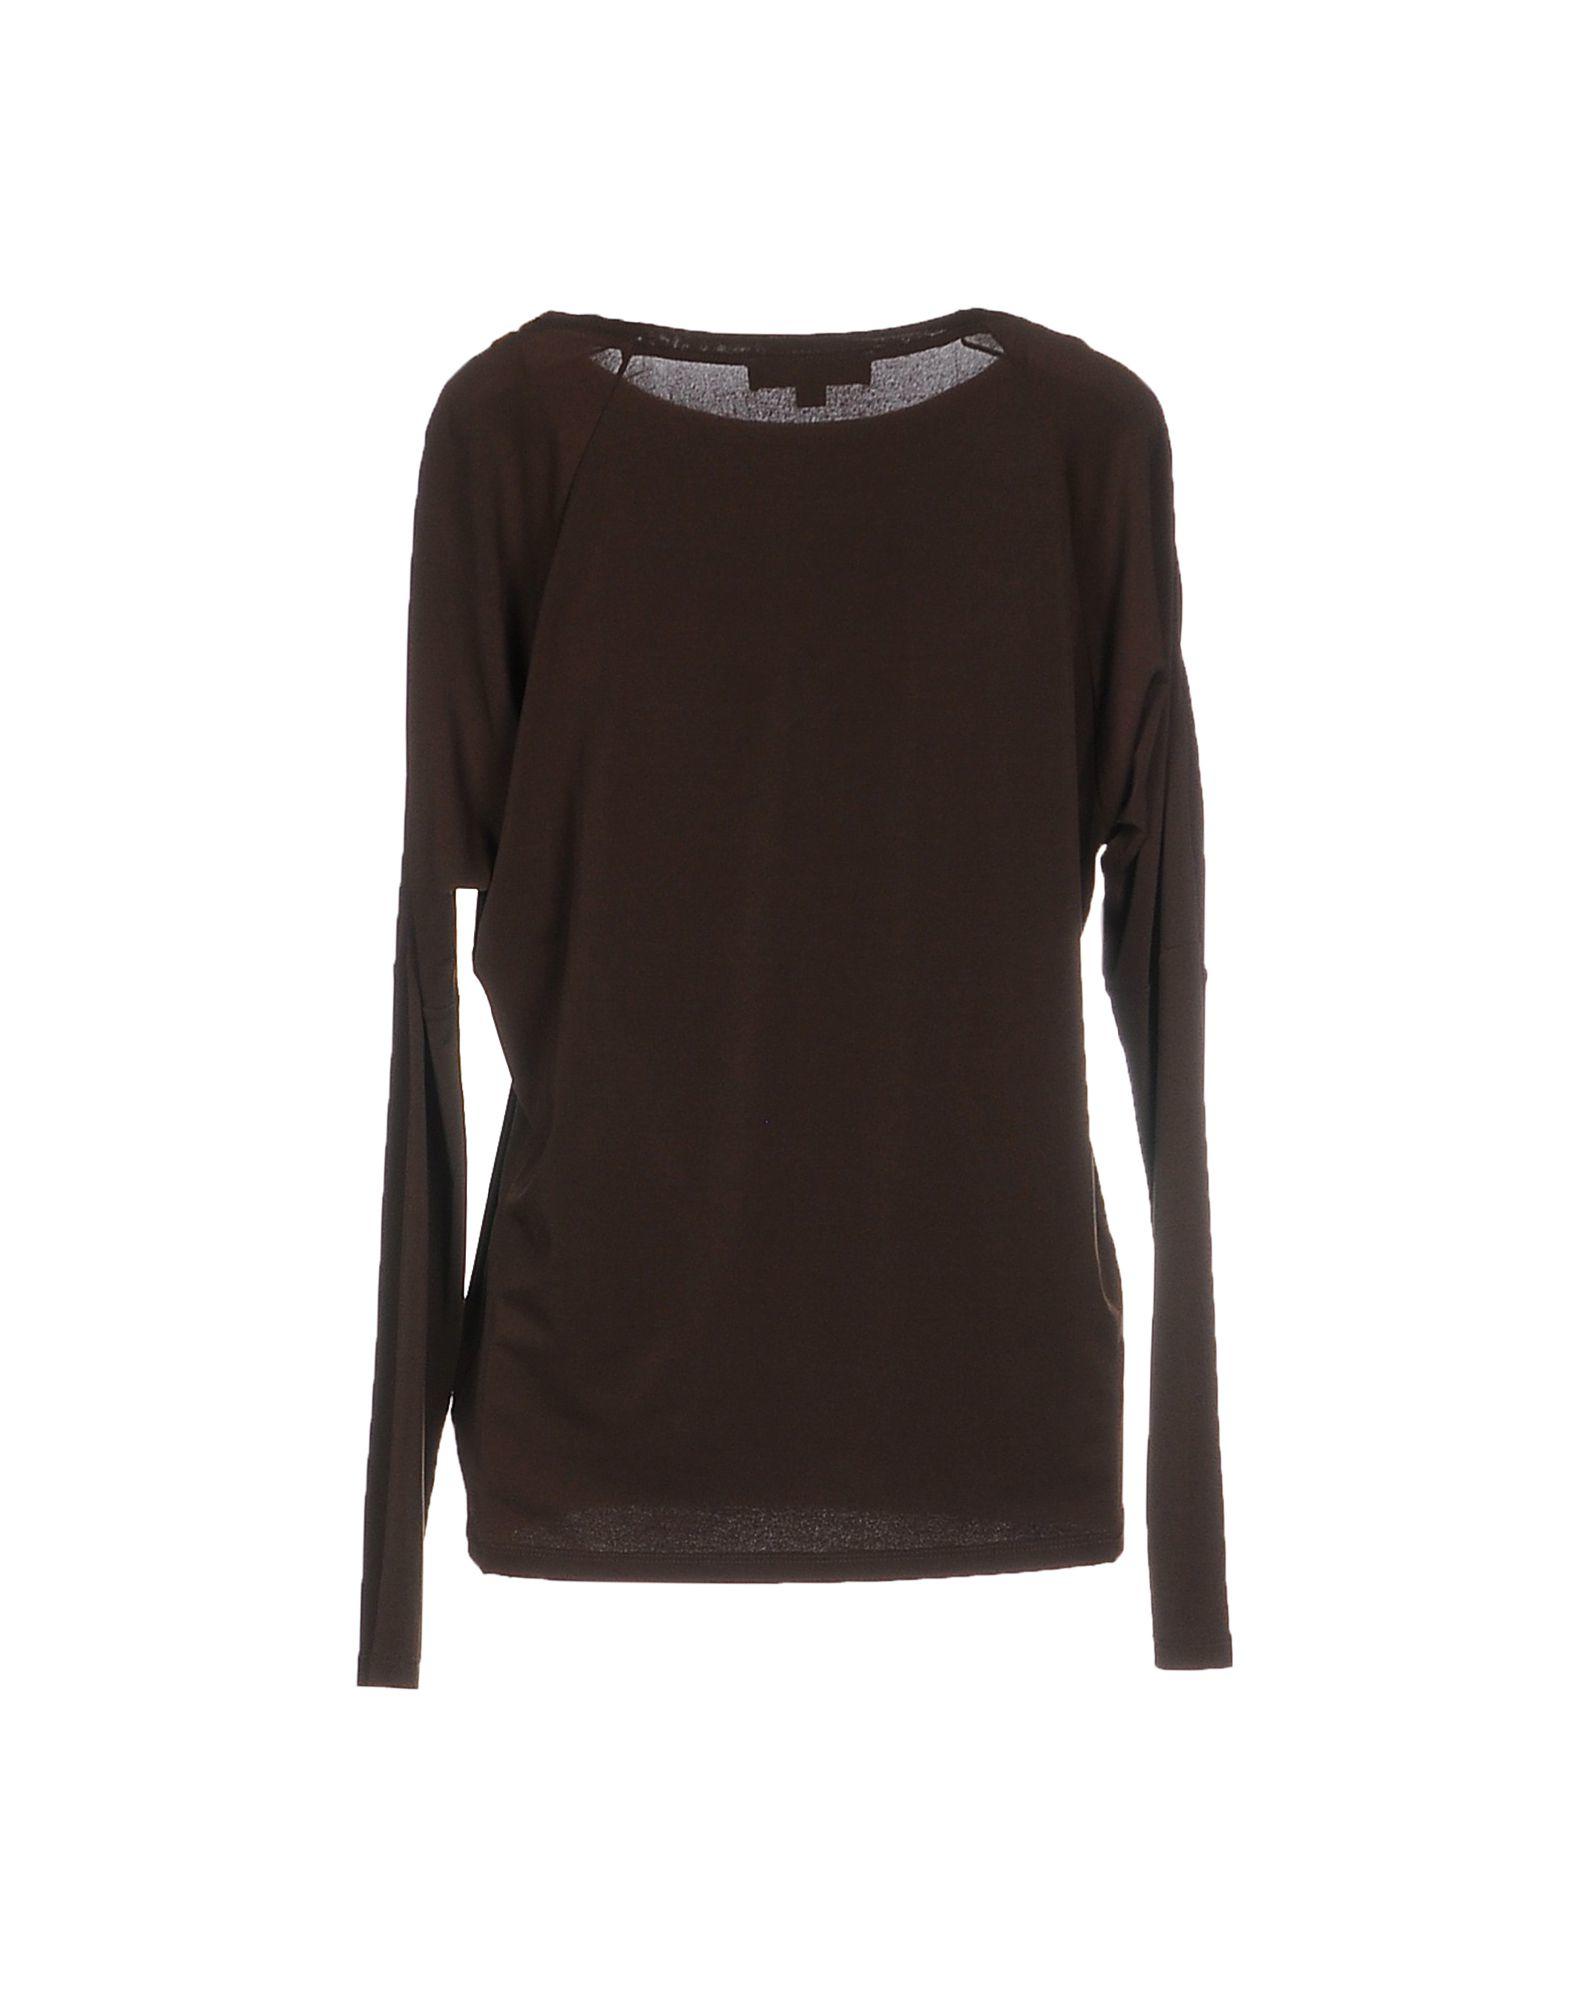 michael michael kors t shirt in brown lyst. Black Bedroom Furniture Sets. Home Design Ideas